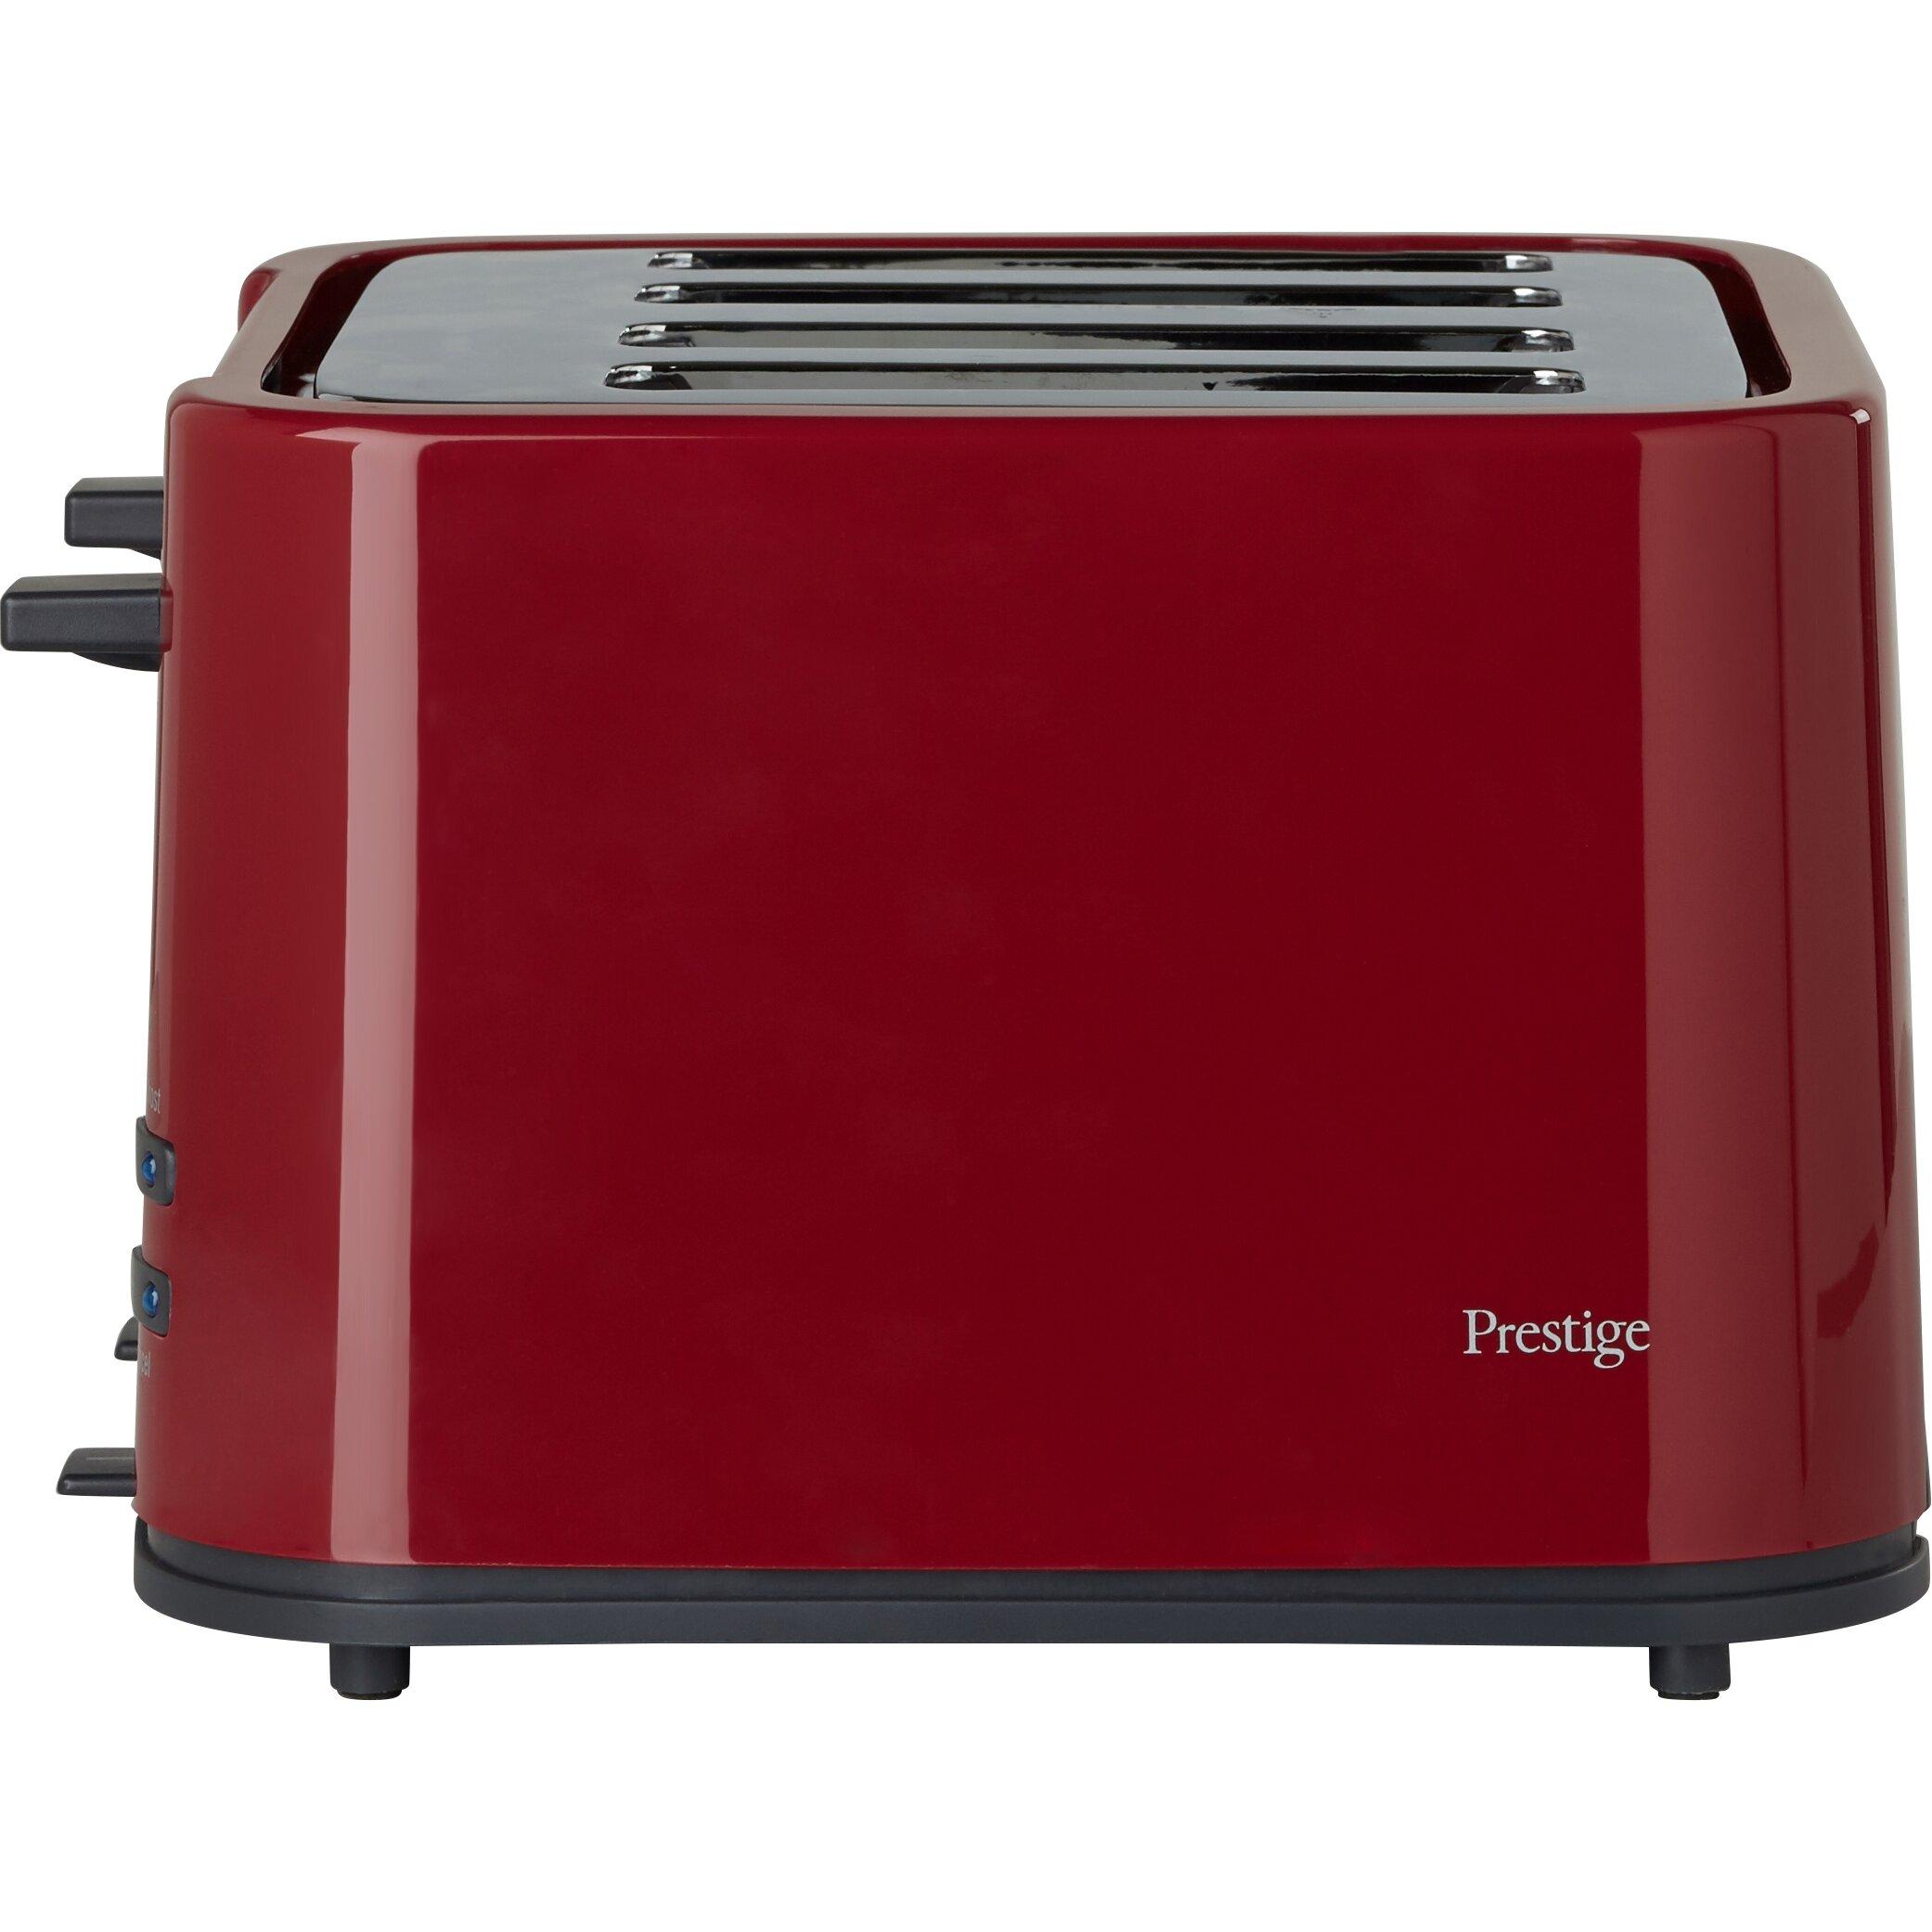 Glass Toaster 4 Slice ~ Prestige eco slice toaster reviews wayfair uk